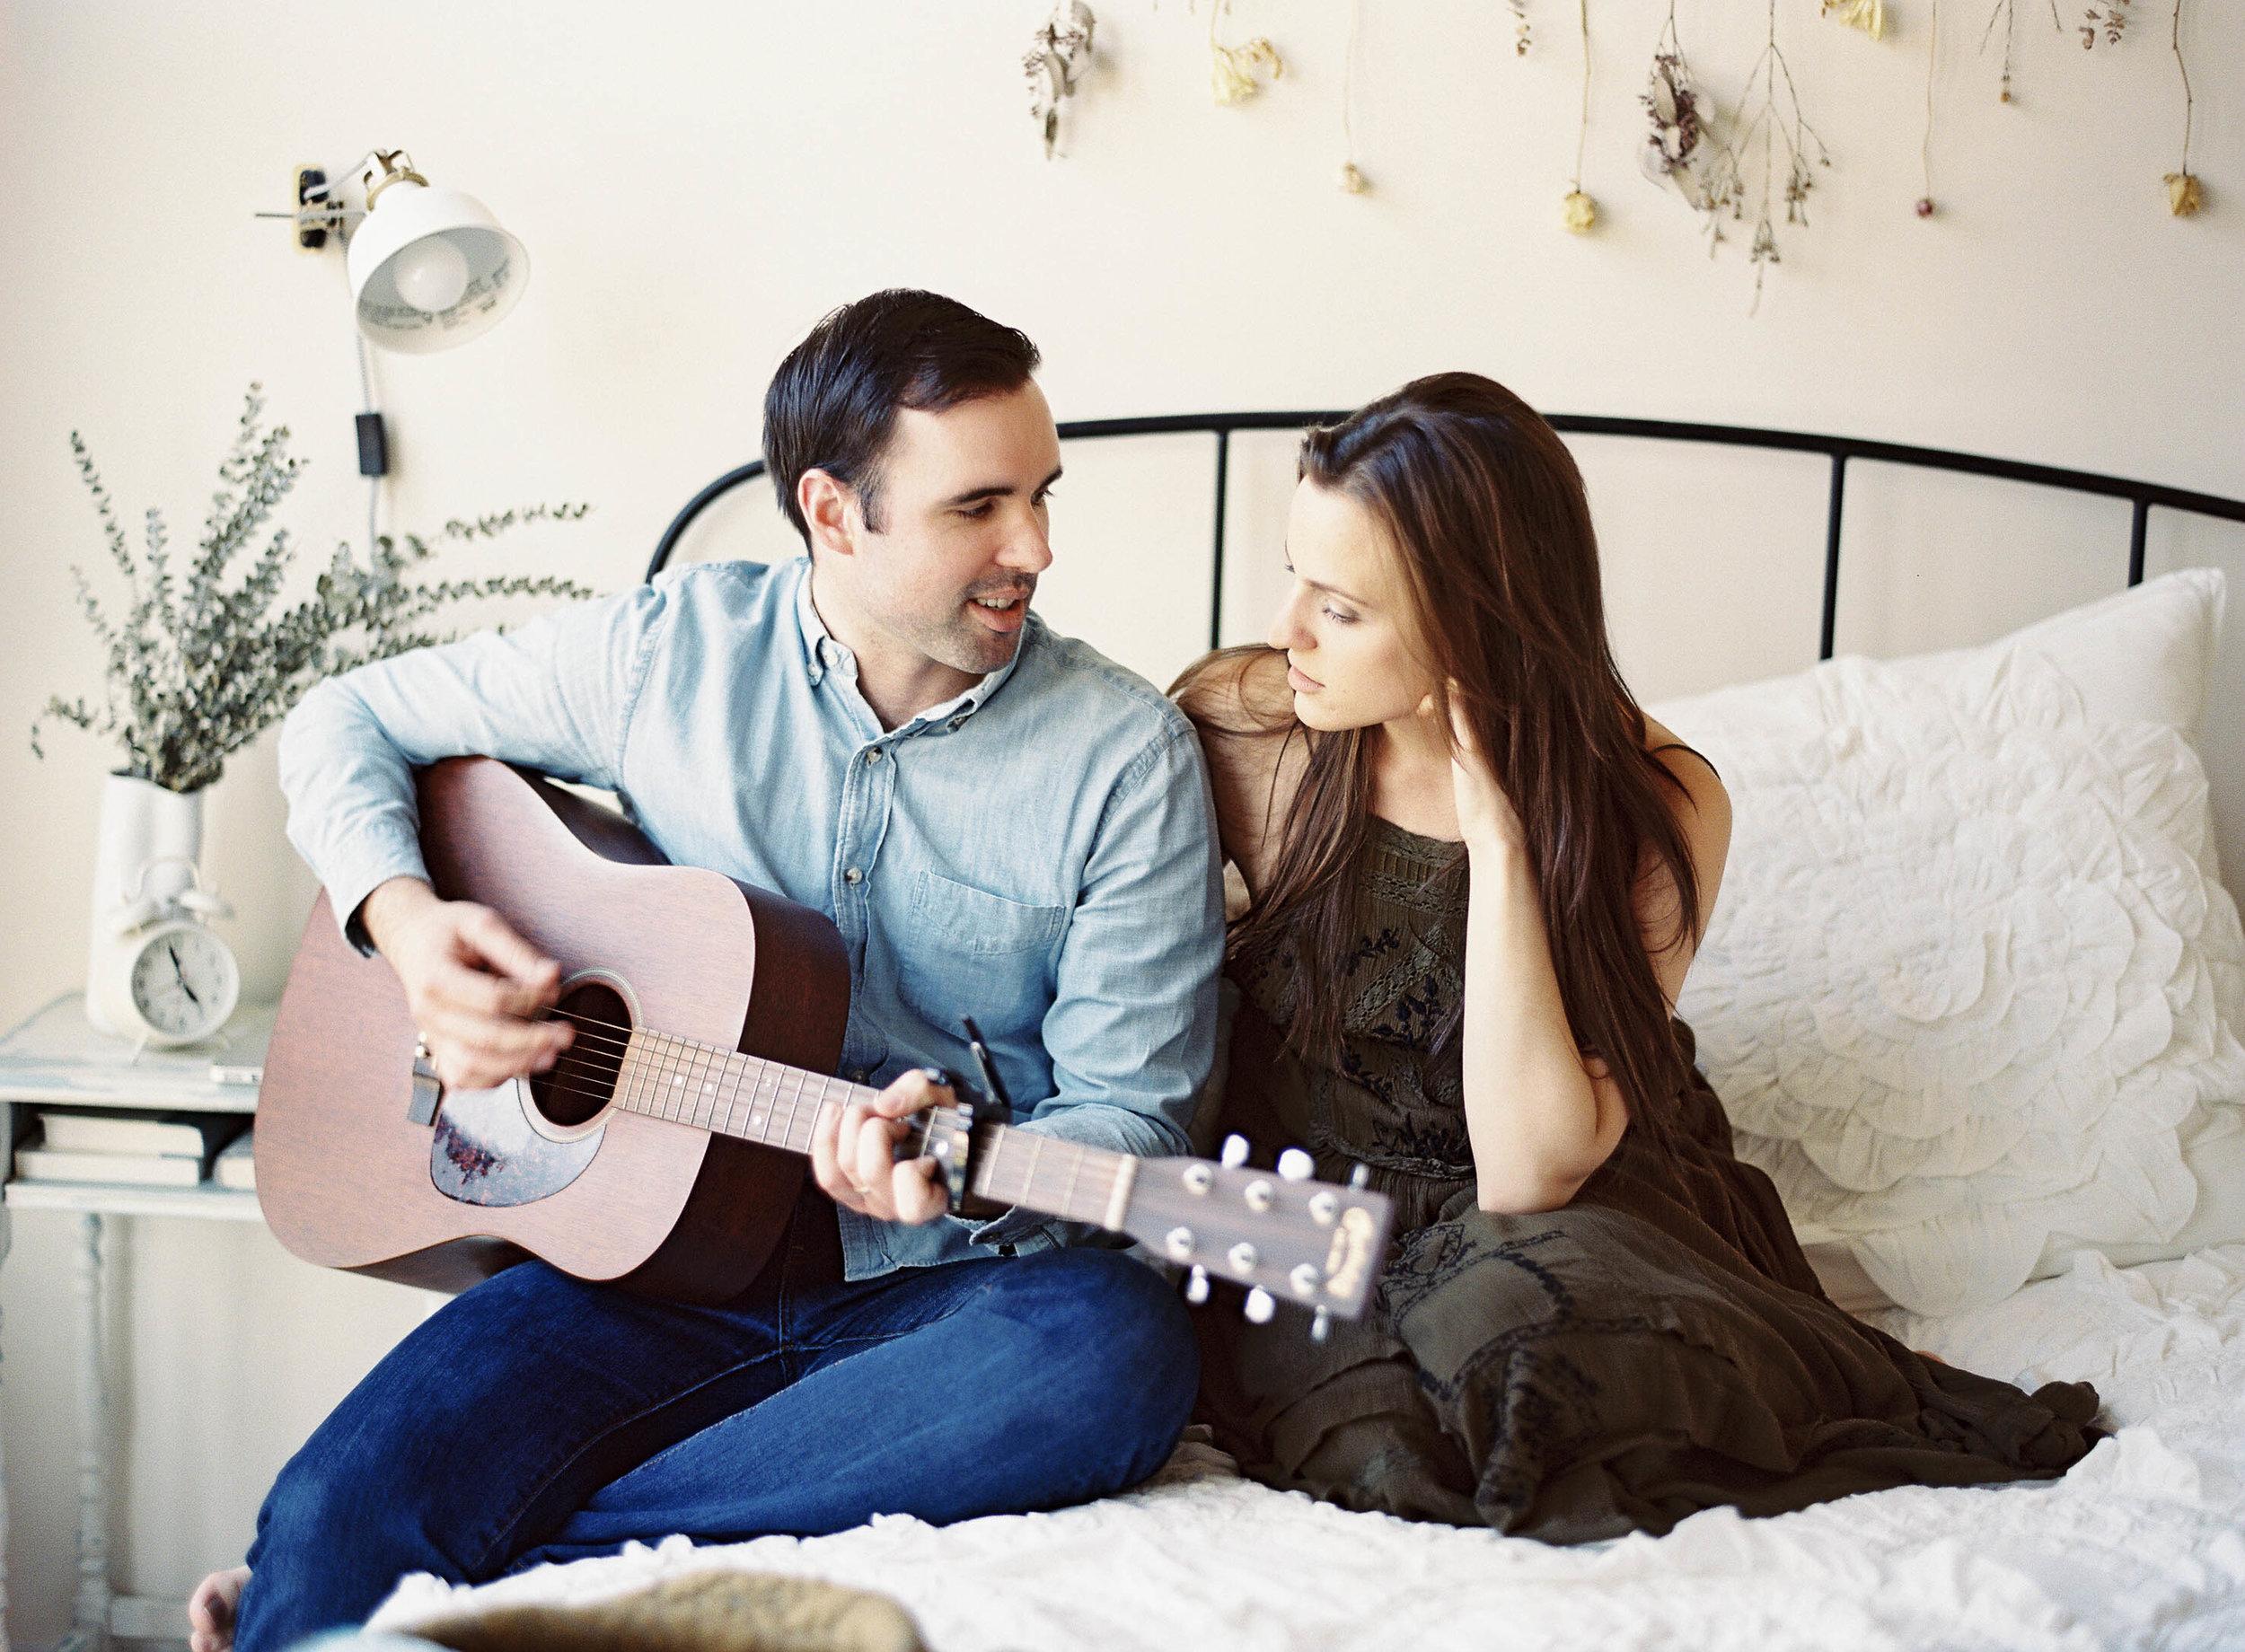 Meghan Mehan Photography | Fine Art Film Wedding Photographer | California | San Francisco | Napa | Sonoma | Santa Barbara | Big Sur | Los Angeles | Destination Wedding Photographer 034.jpg